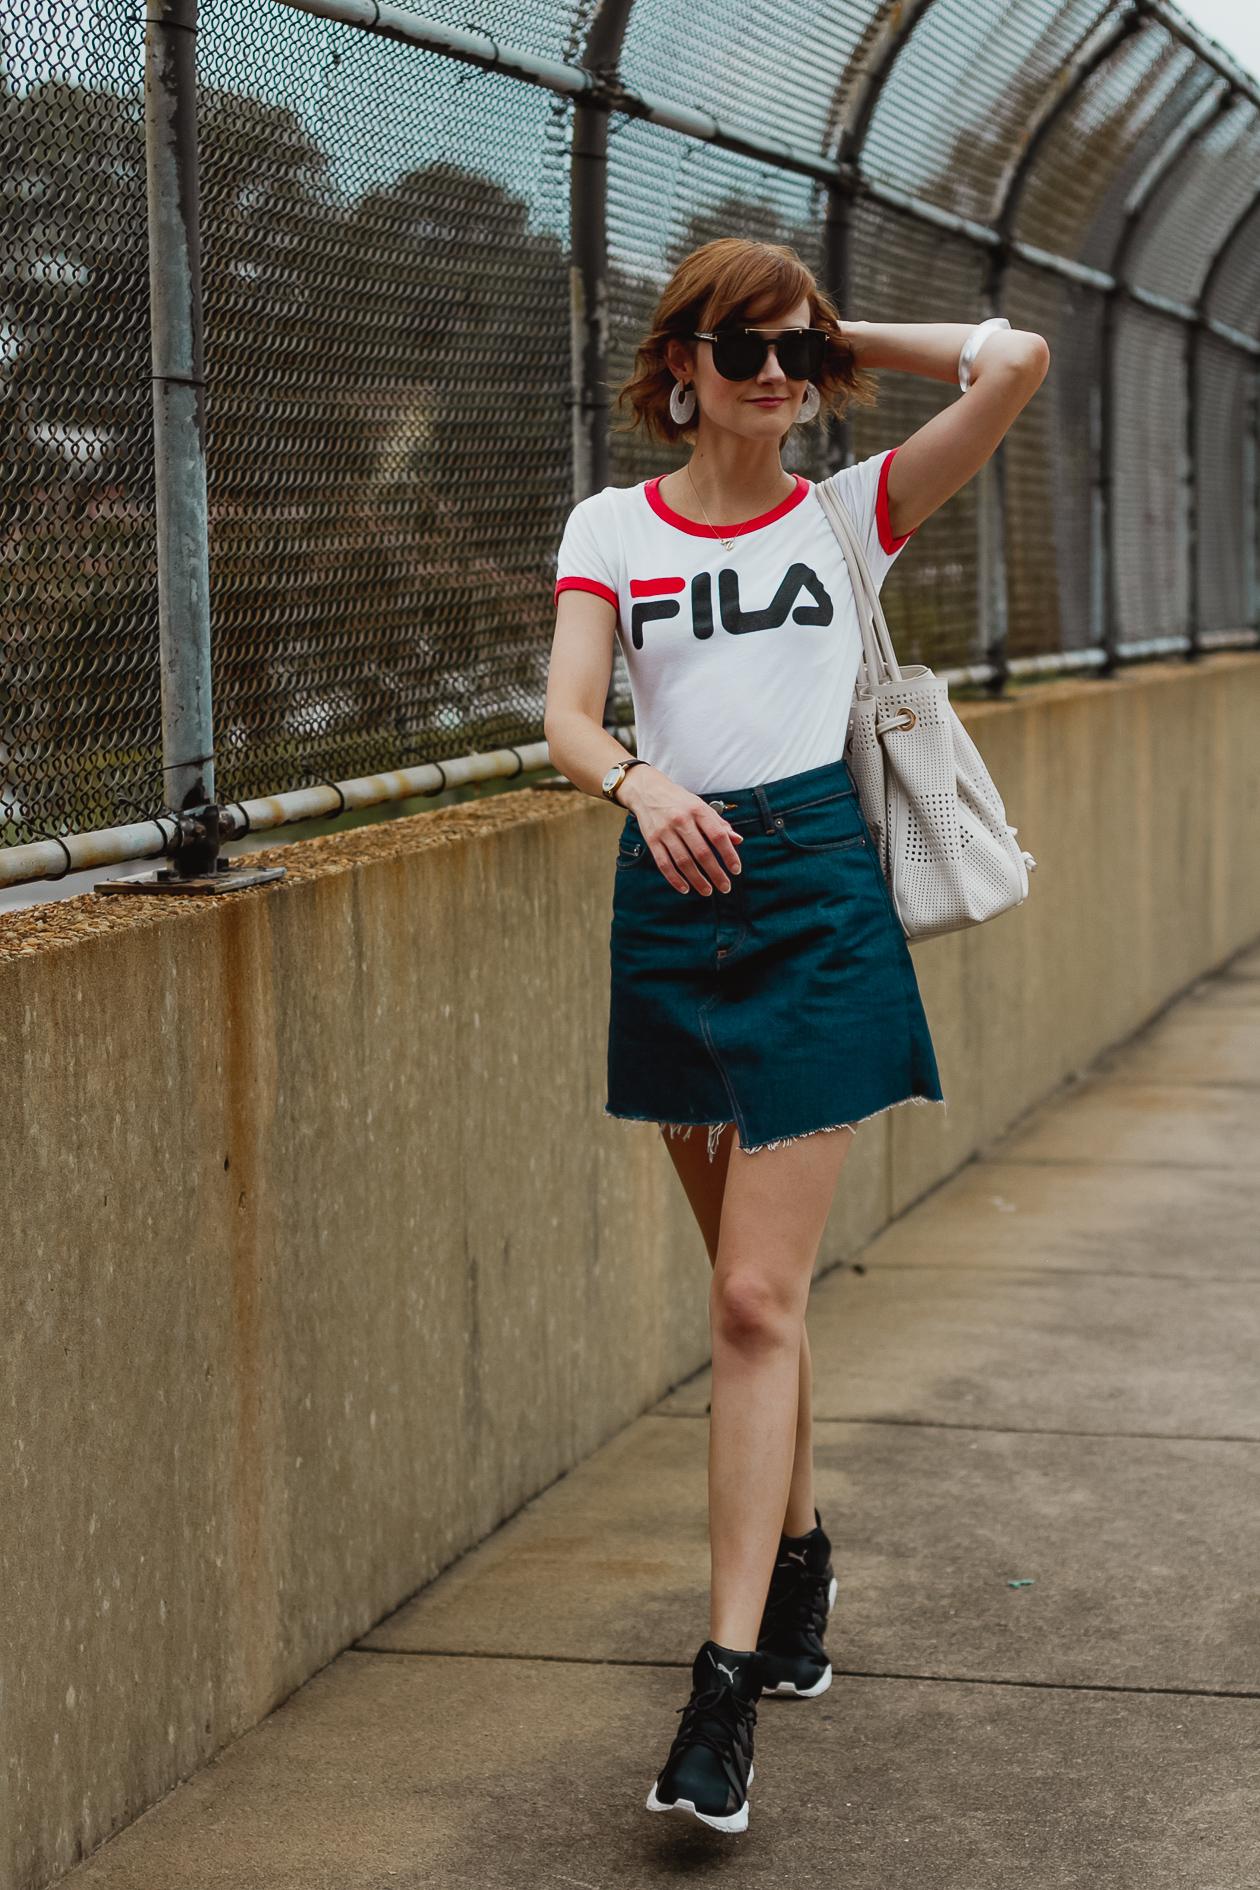 Fila t-shirt and & Other Stories denim skirt